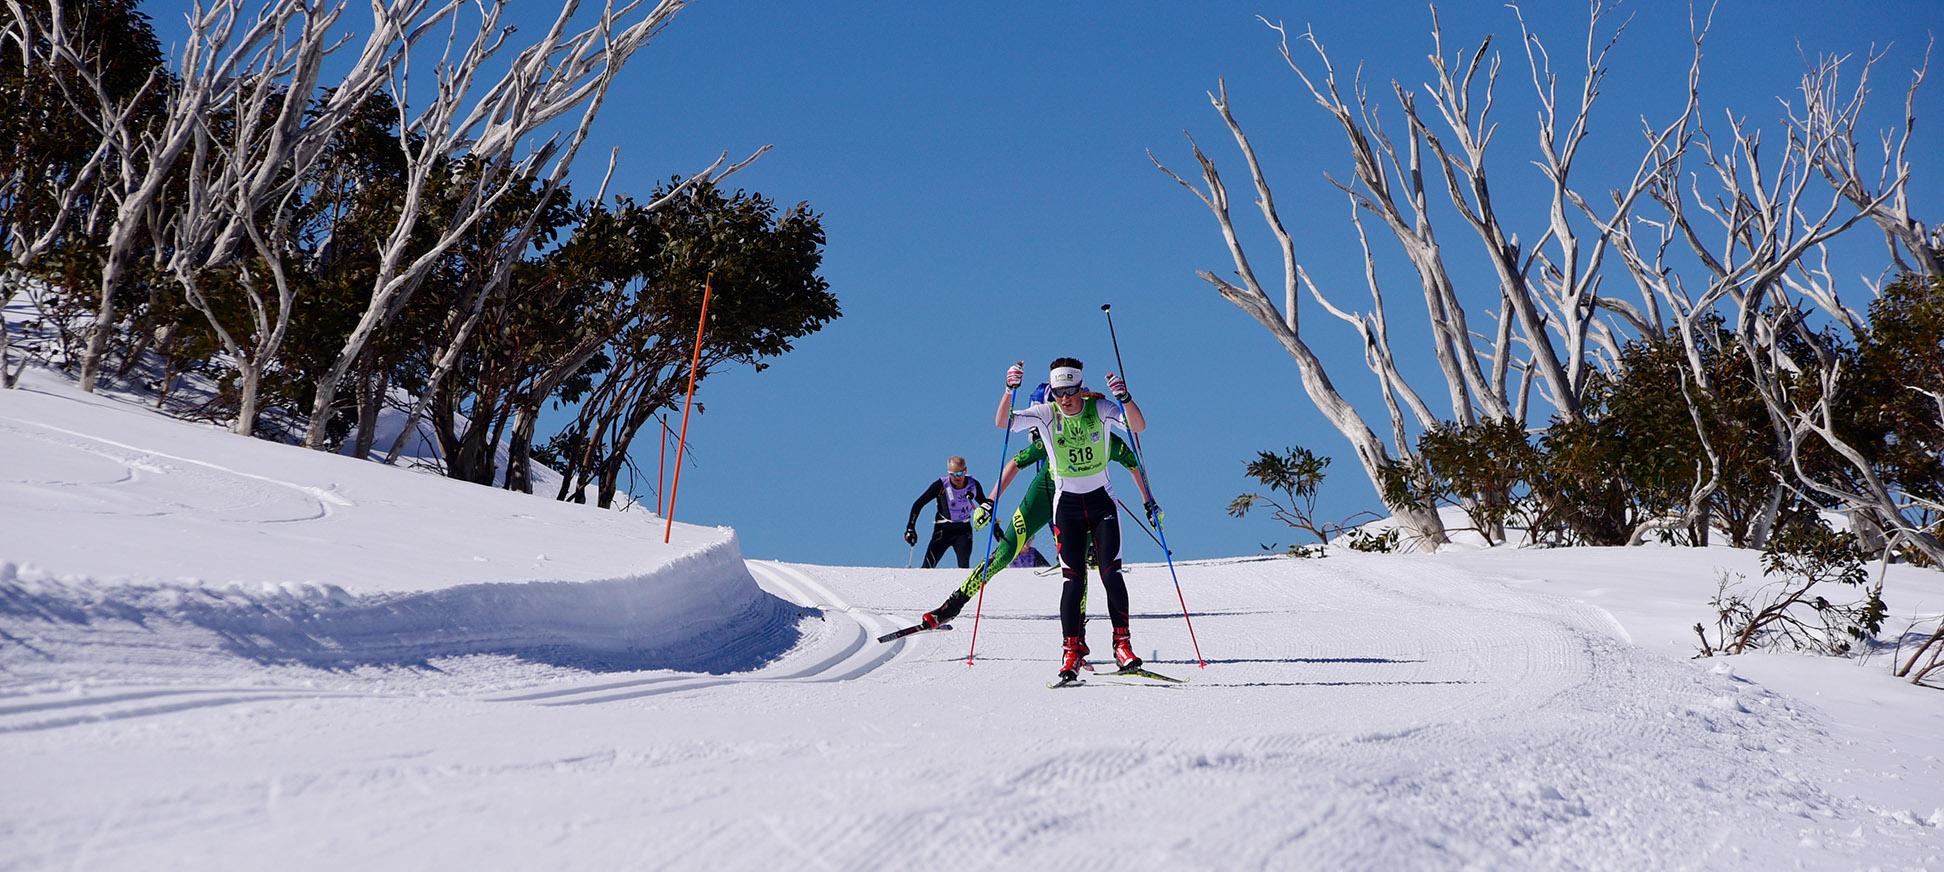 SMGS Elite Snowsports Academy XC